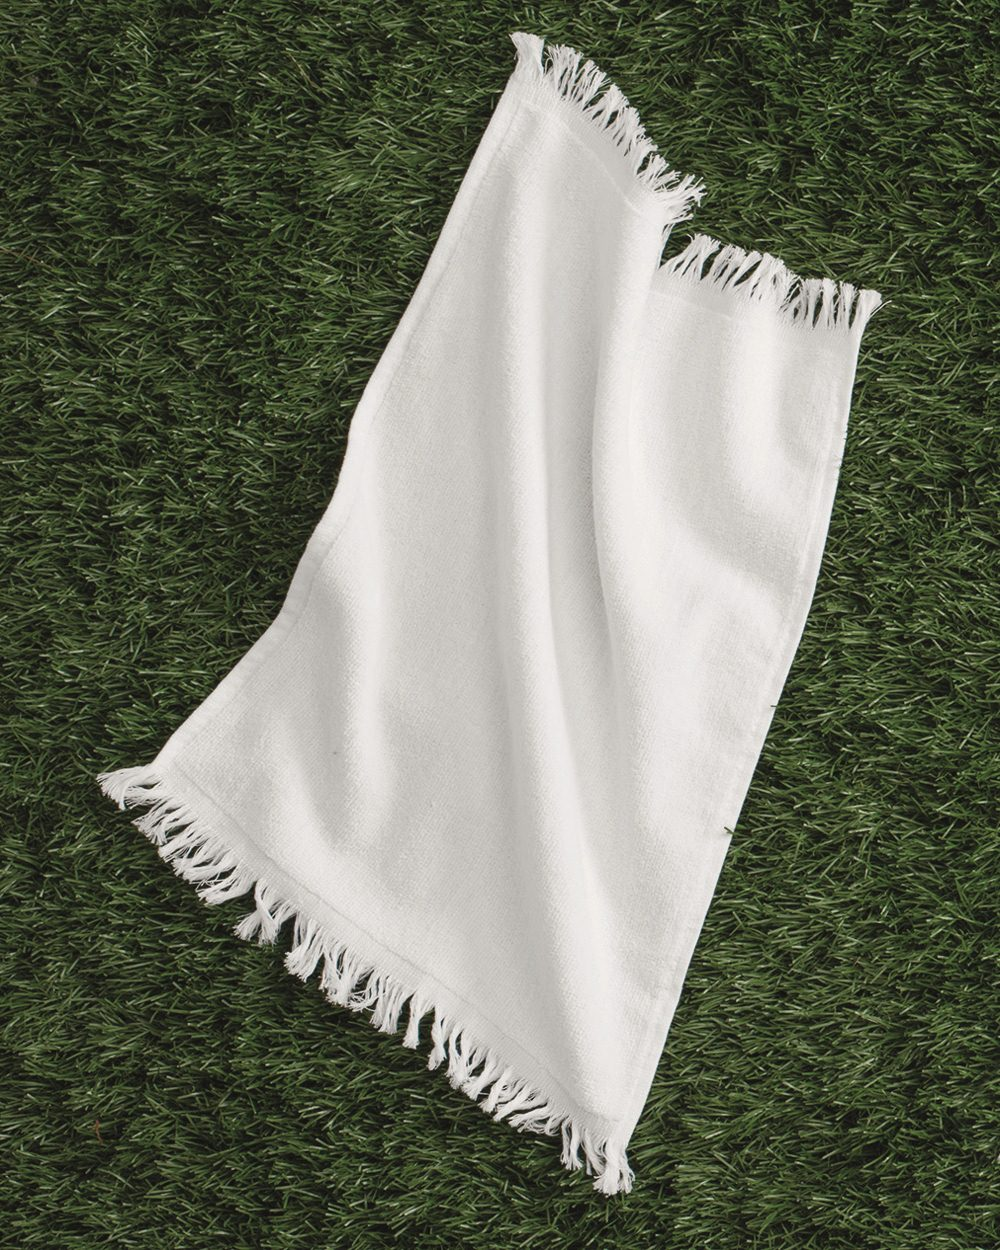 Carmel Towel Company Fringed Towel - C1118